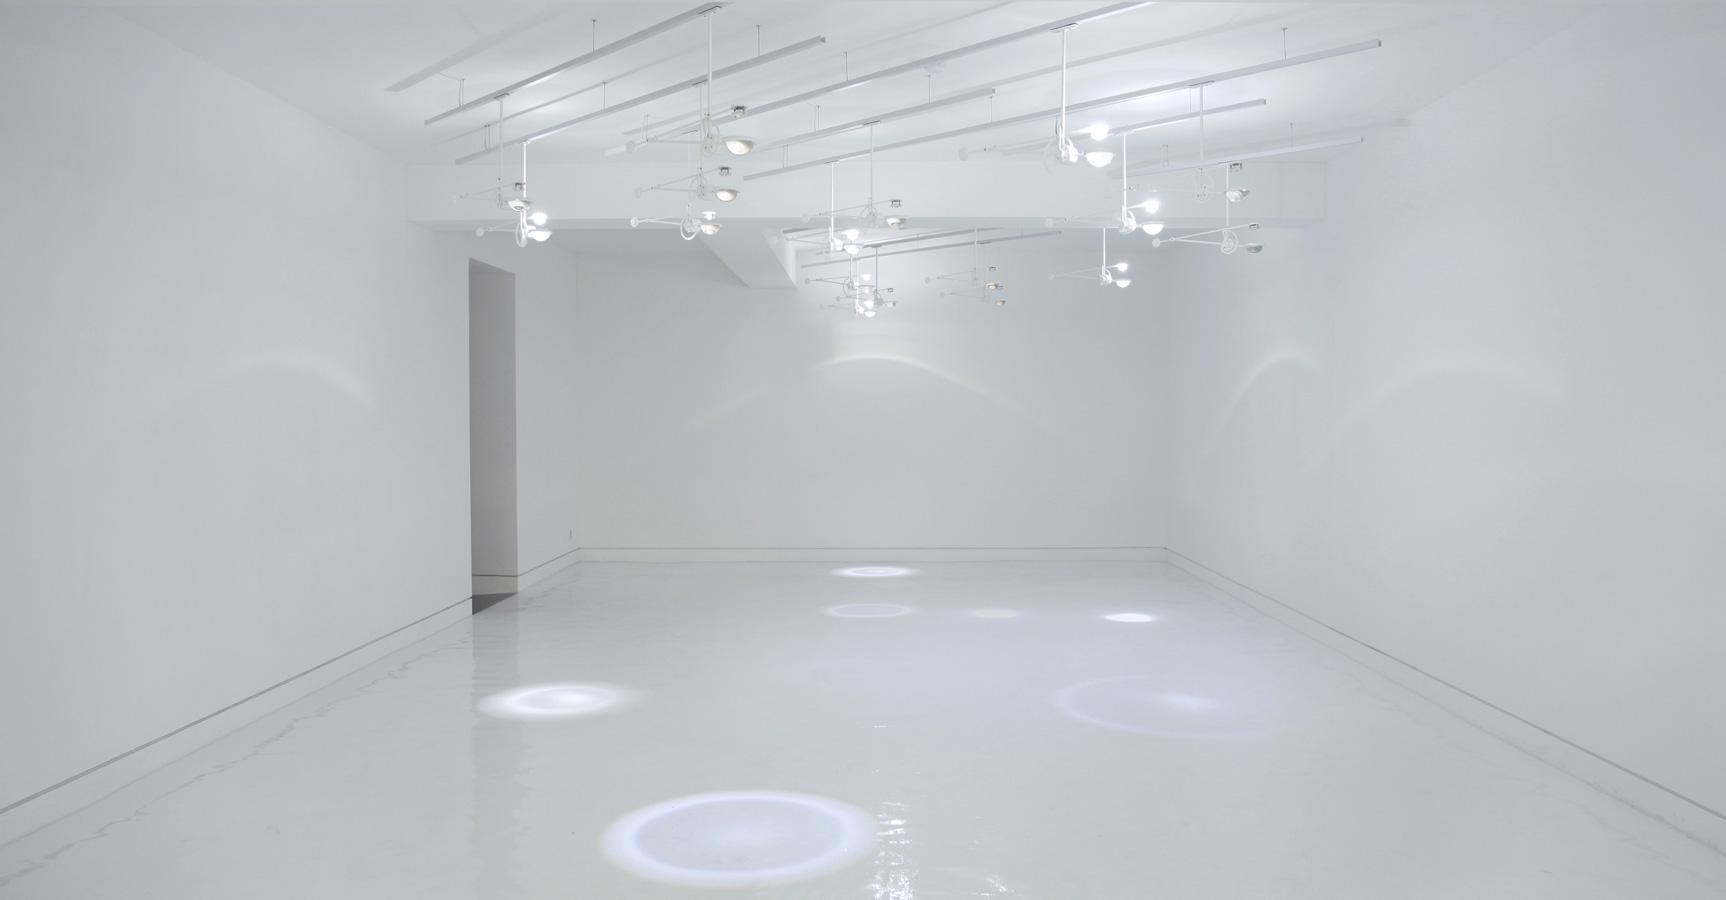 http://www.troika.uk.com/wp-content/uploads/2014/03/Troika_Falling-Light_Daelim-Museum.jpg ?>